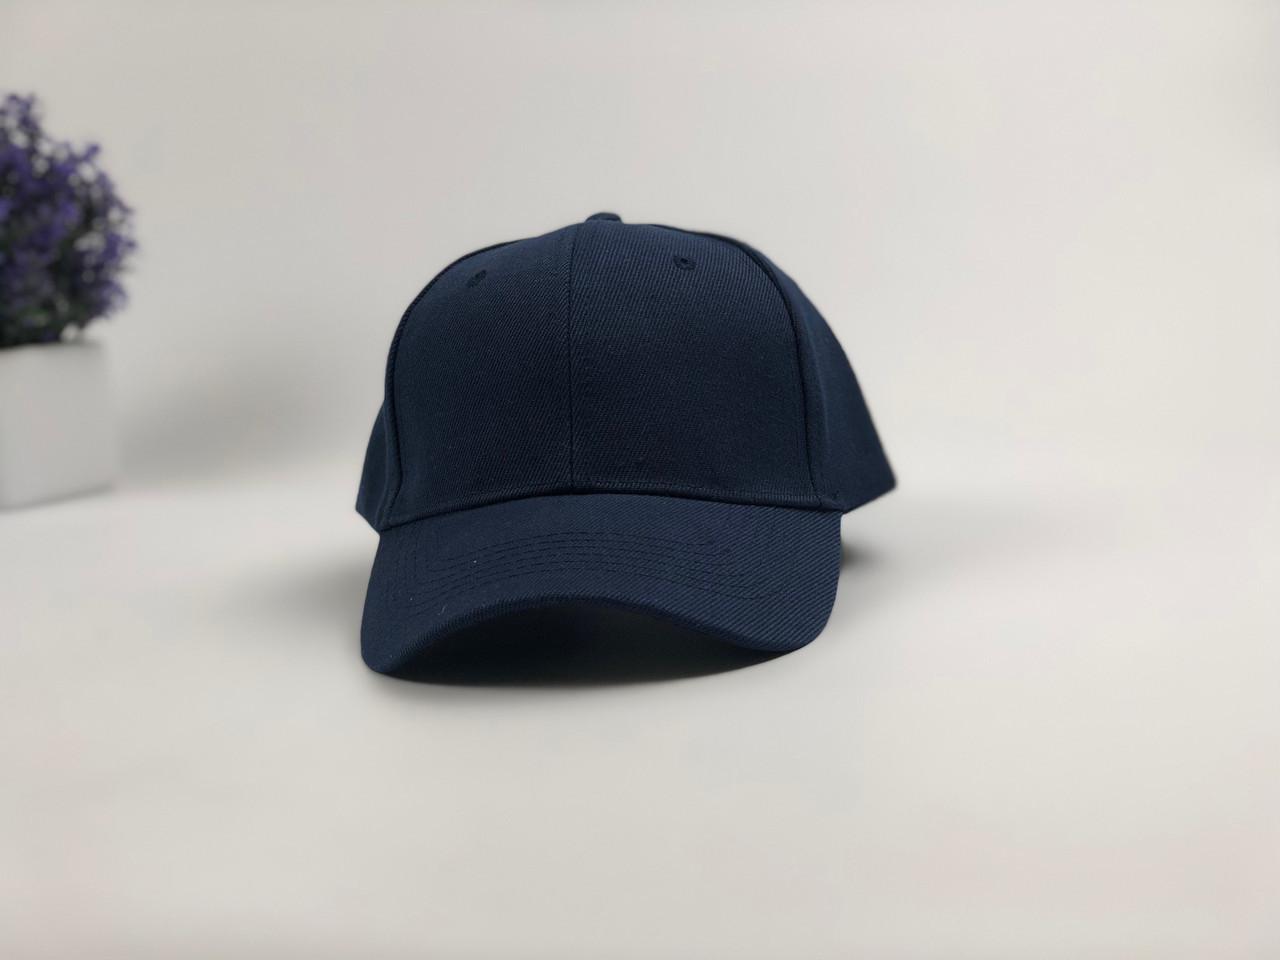 Кепка бейсболка Style (темно-синяя)